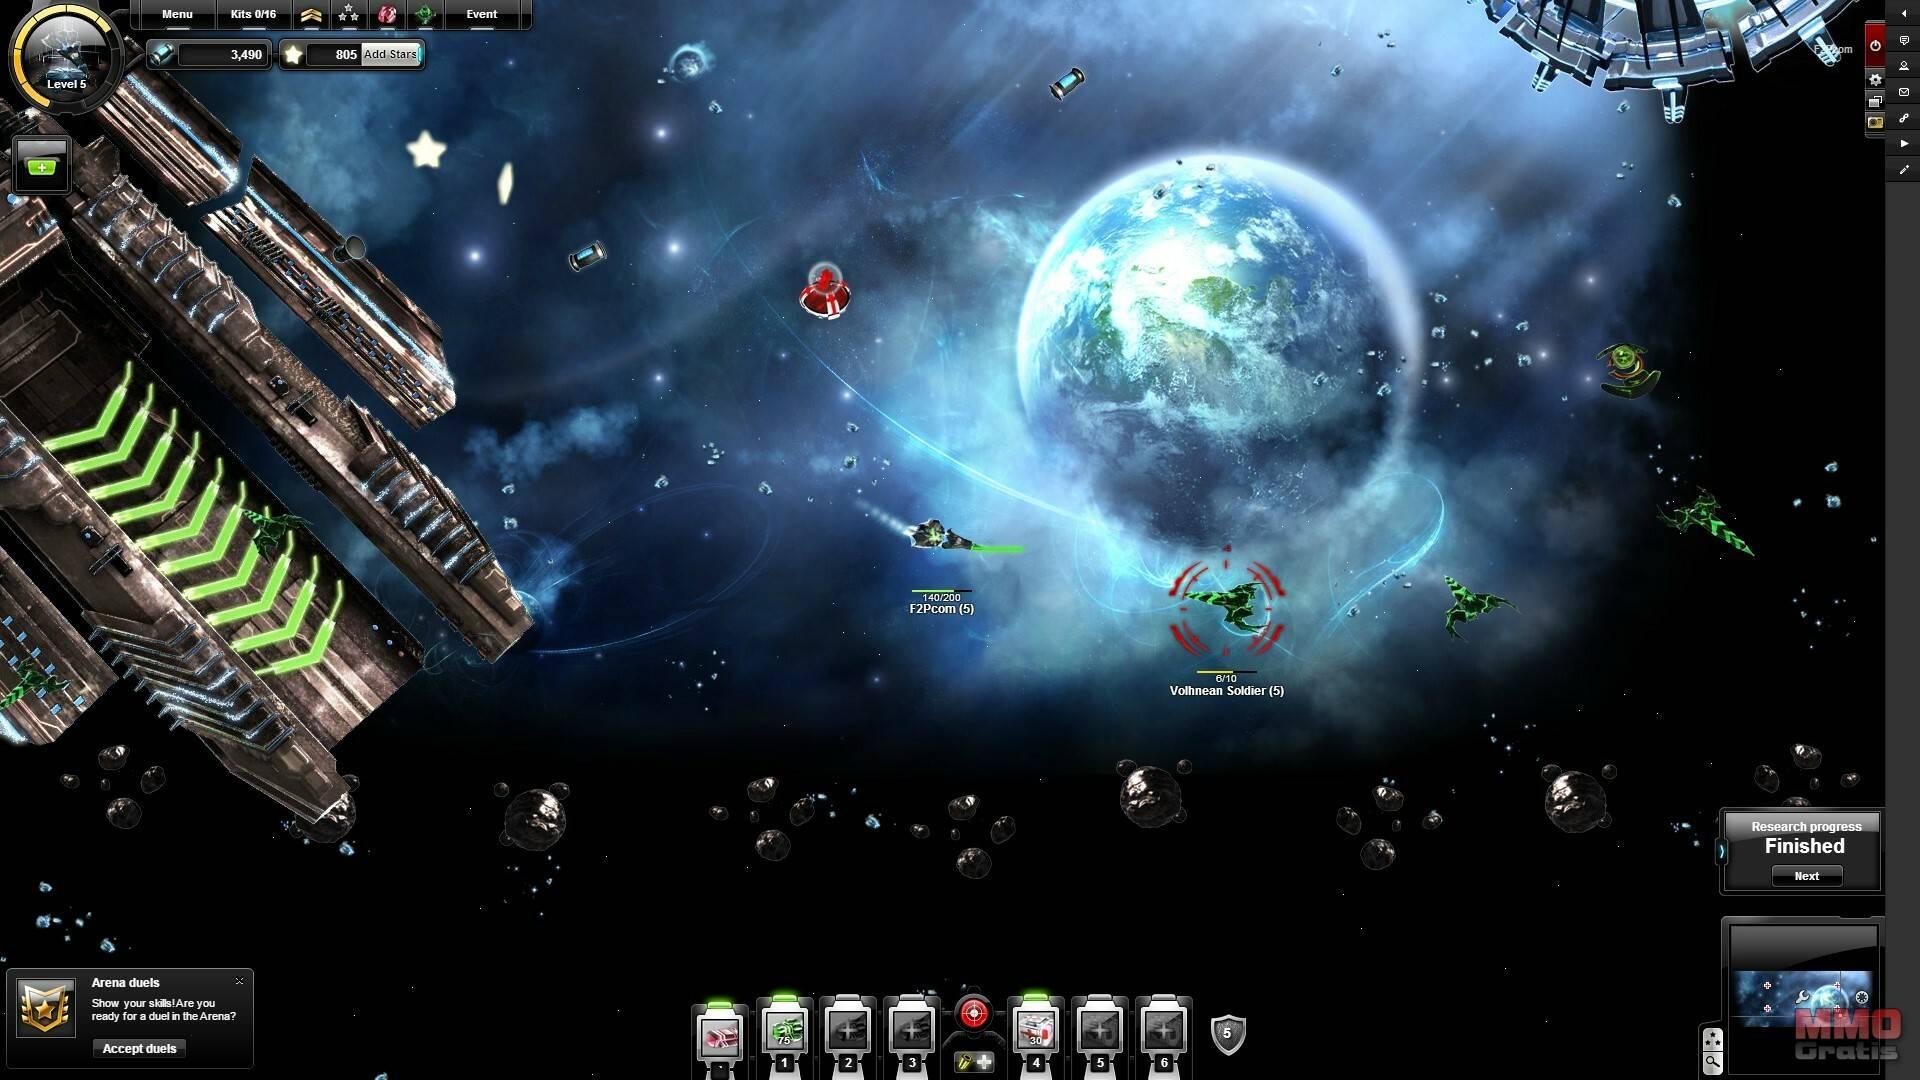 Imagenes de Nova Raider